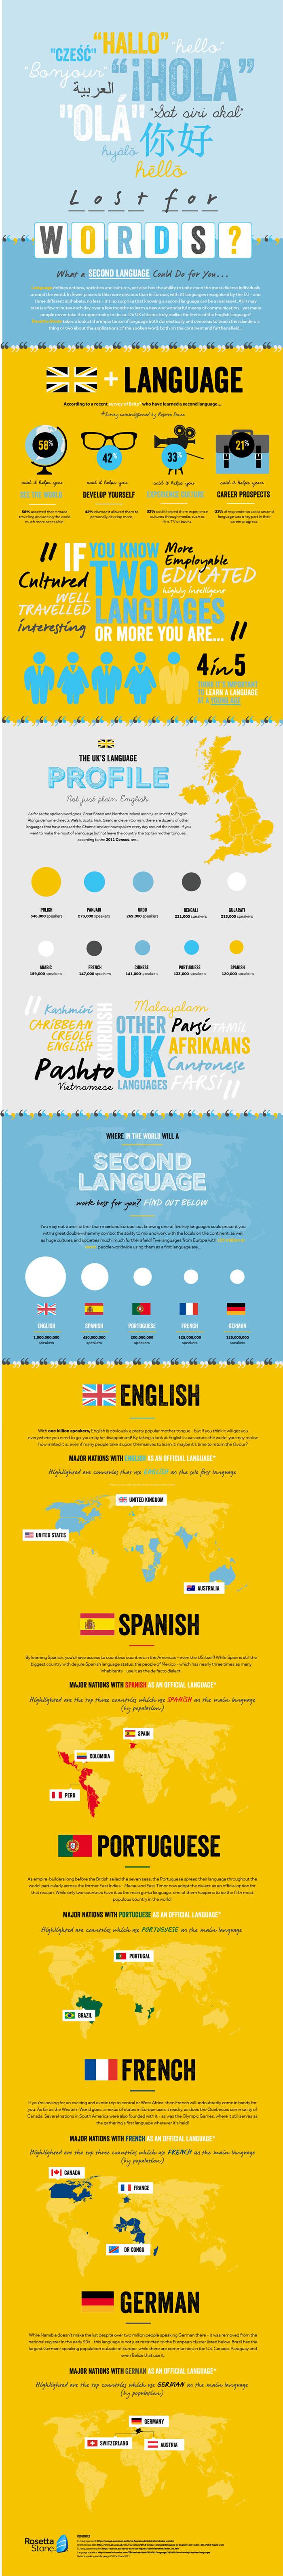 Second Language Benefits-Infographic